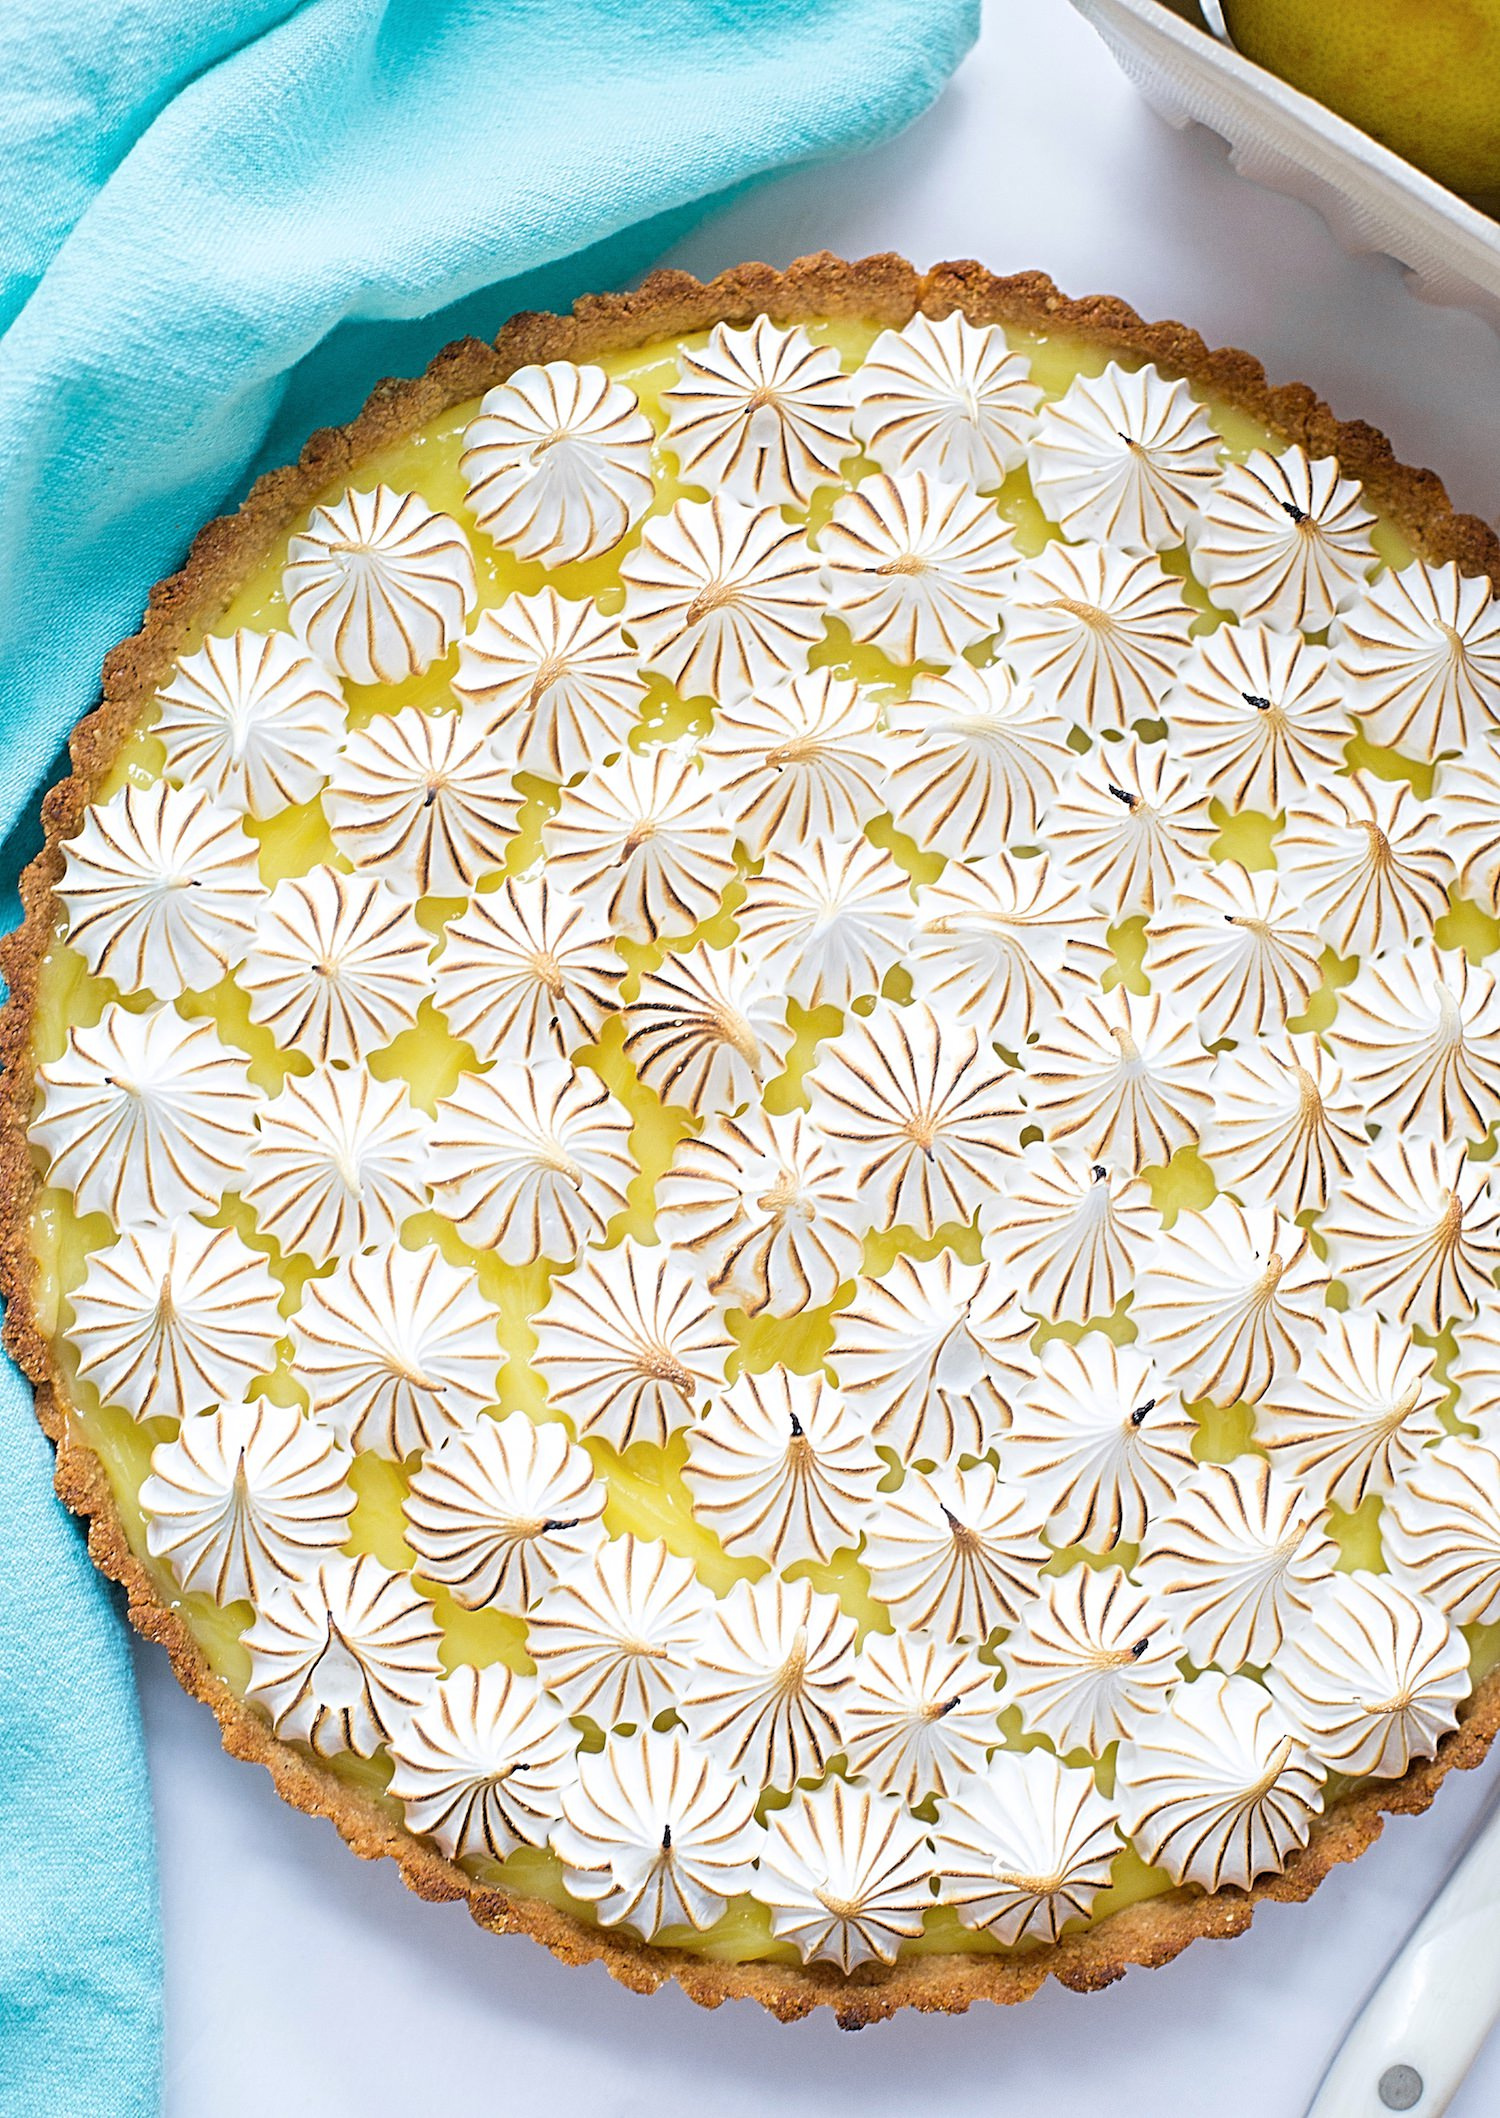 pesach lemon meringie pie 2.jpgPassover Lemon Meringue Pie (Gluten-Free): tasty almond flour crust, tart and creamy lemon filling, and sweet, marshmallow-like meringue topping. | TrufflesandTrends.com